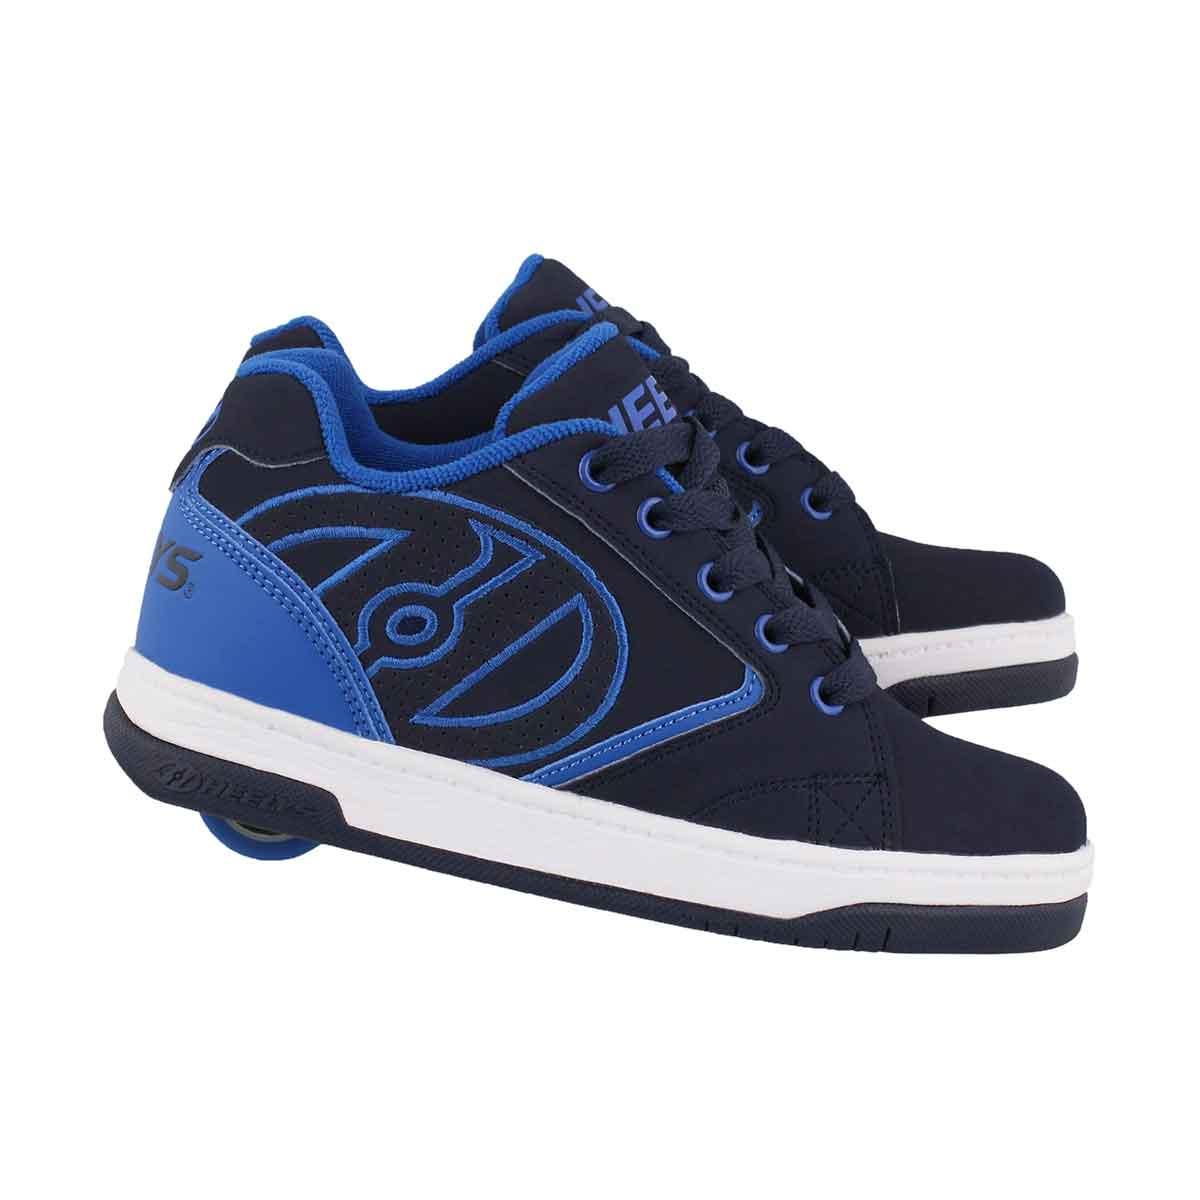 Bys Propel 2.0 nvy/blu/wht skate sneaker